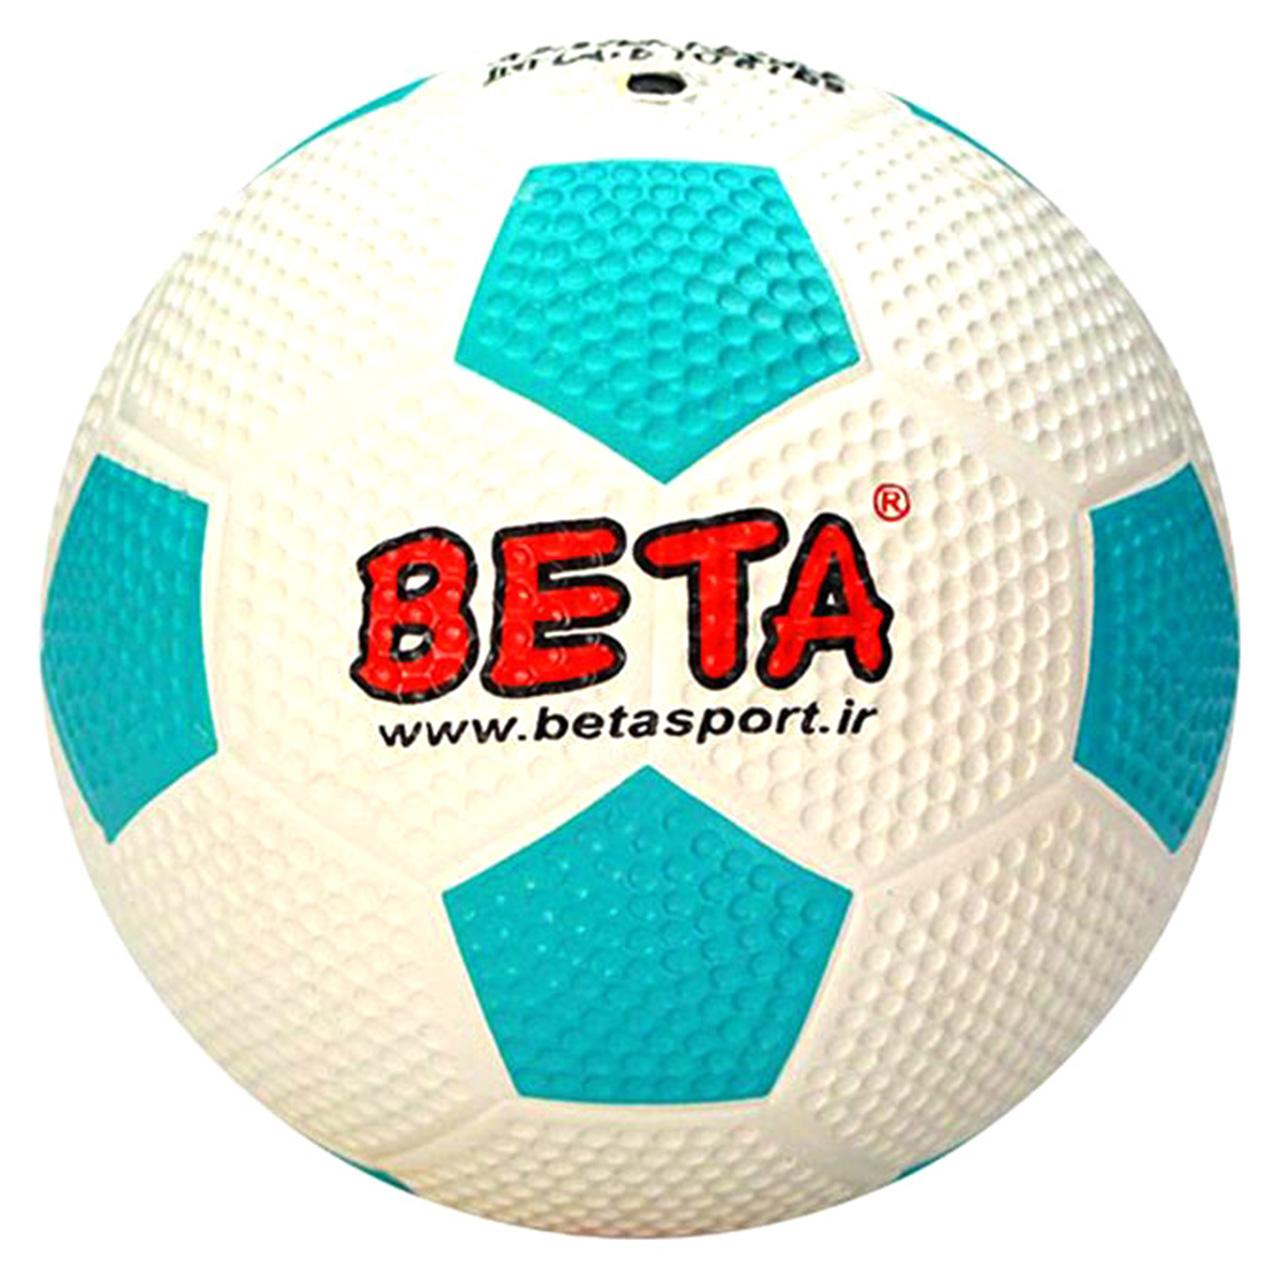 خرید                     توپ فوتبال بتا مدل PSRG سایز 1 سایز 1